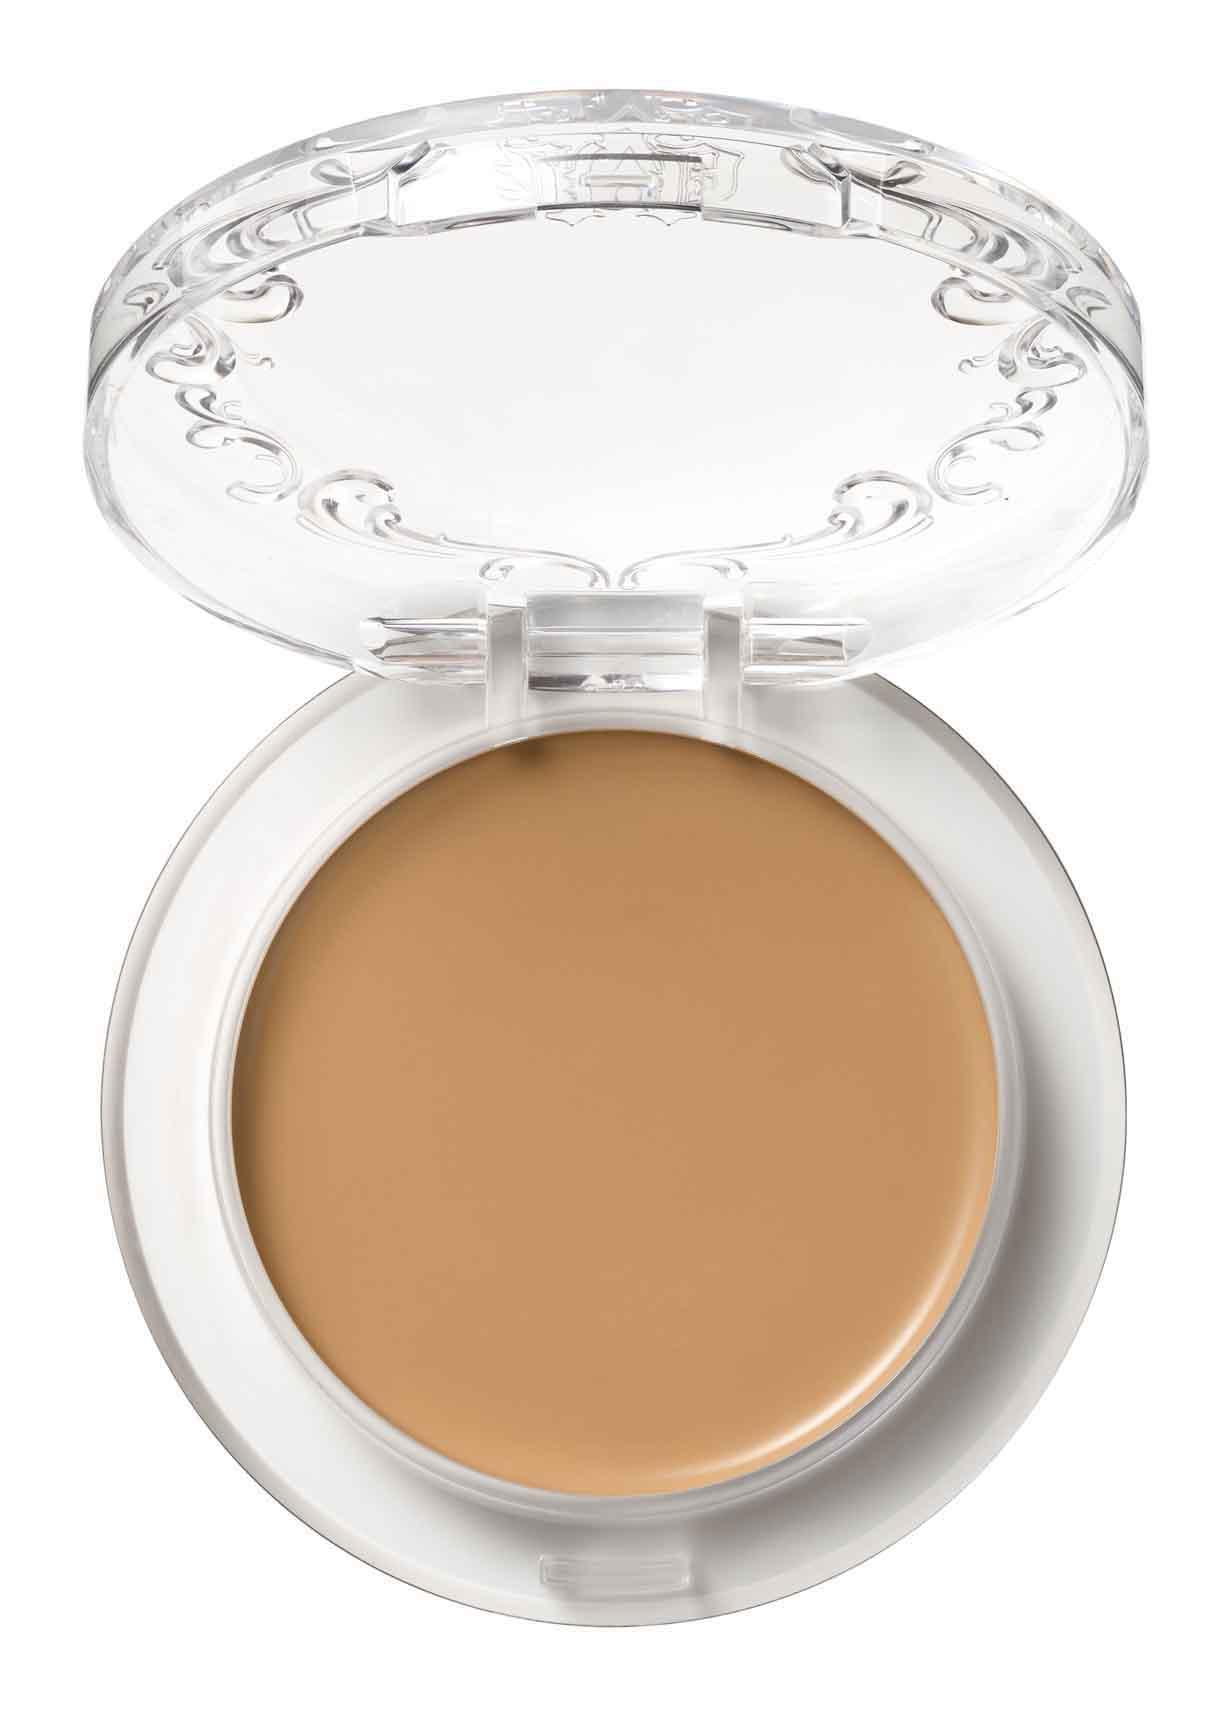 KVD Vegan Beauty Good Apple Skin Perfecting Hydrating Foundation Balm